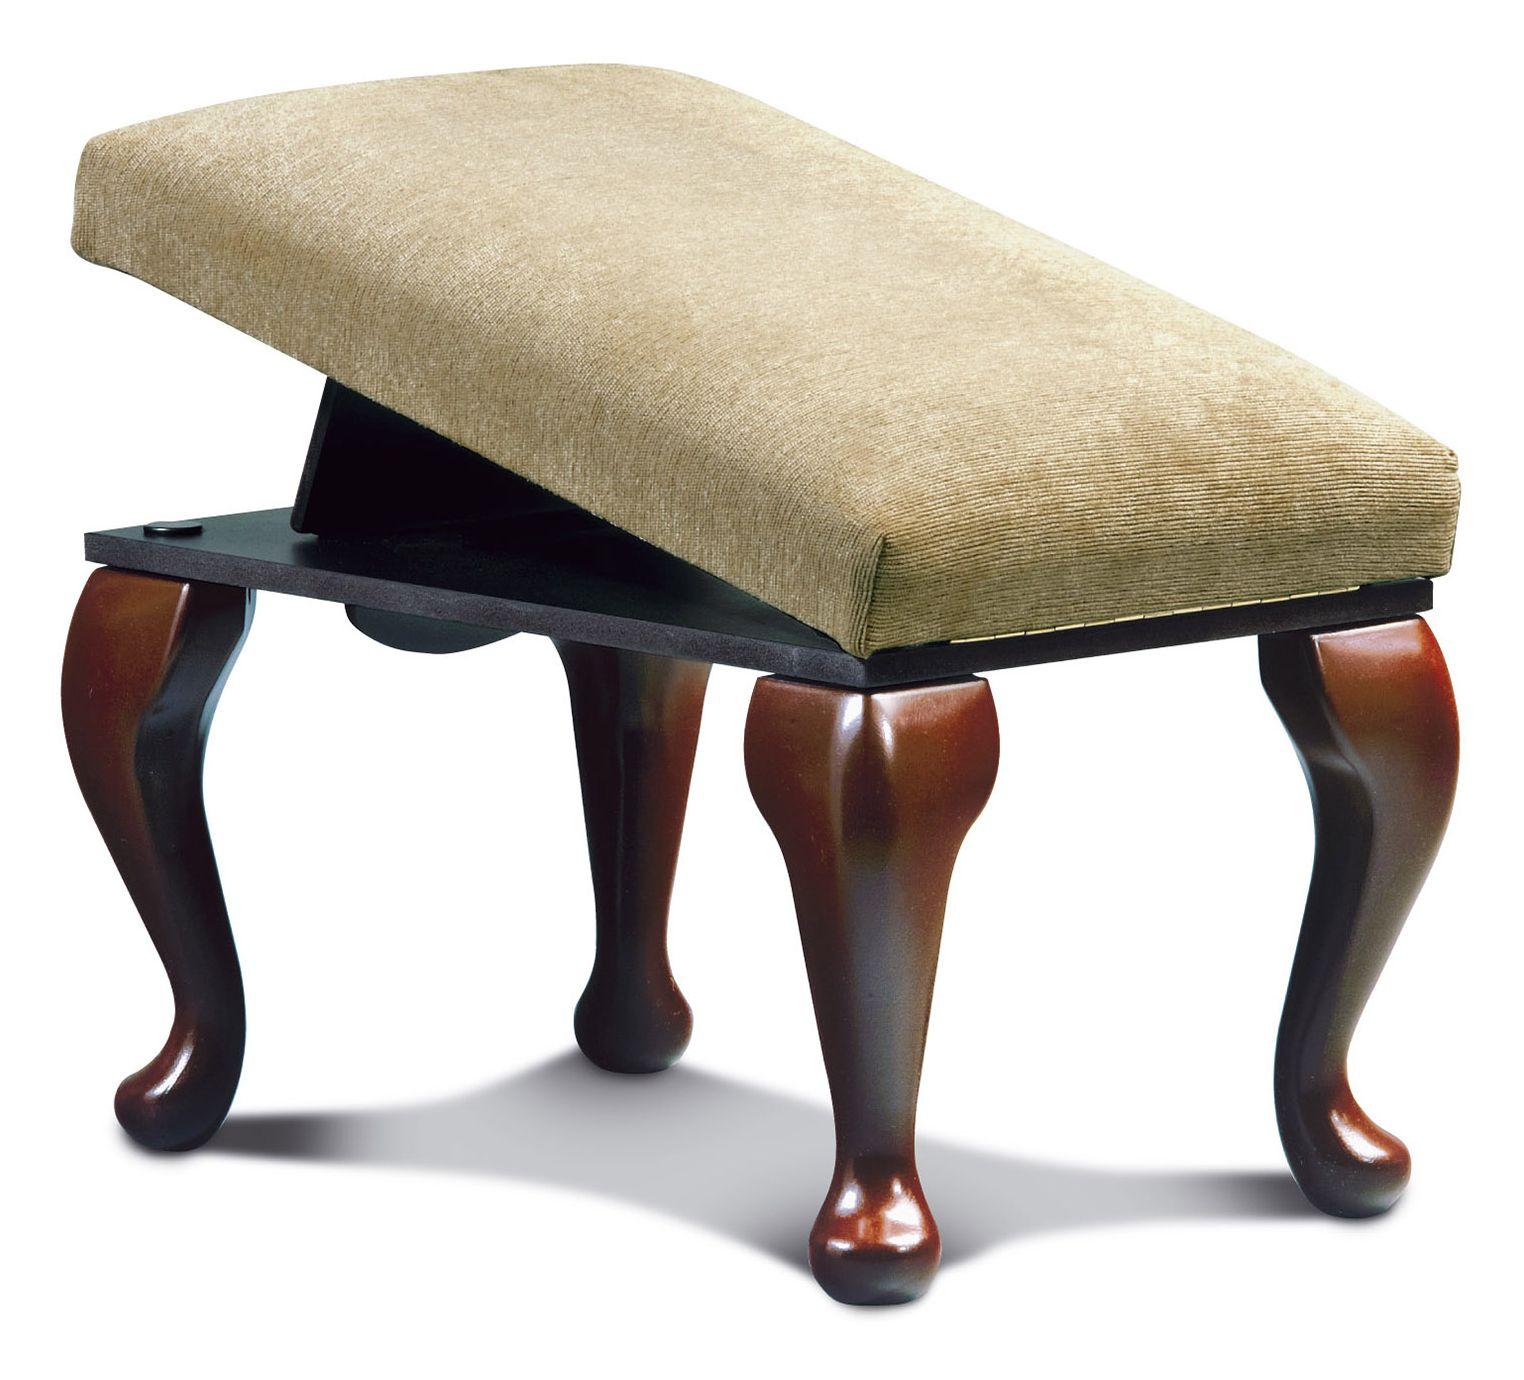 Ottomans Sherborne Ottoman Large: Sherborne Upholstery Sherborne Brompton/Shildon Leg Rest